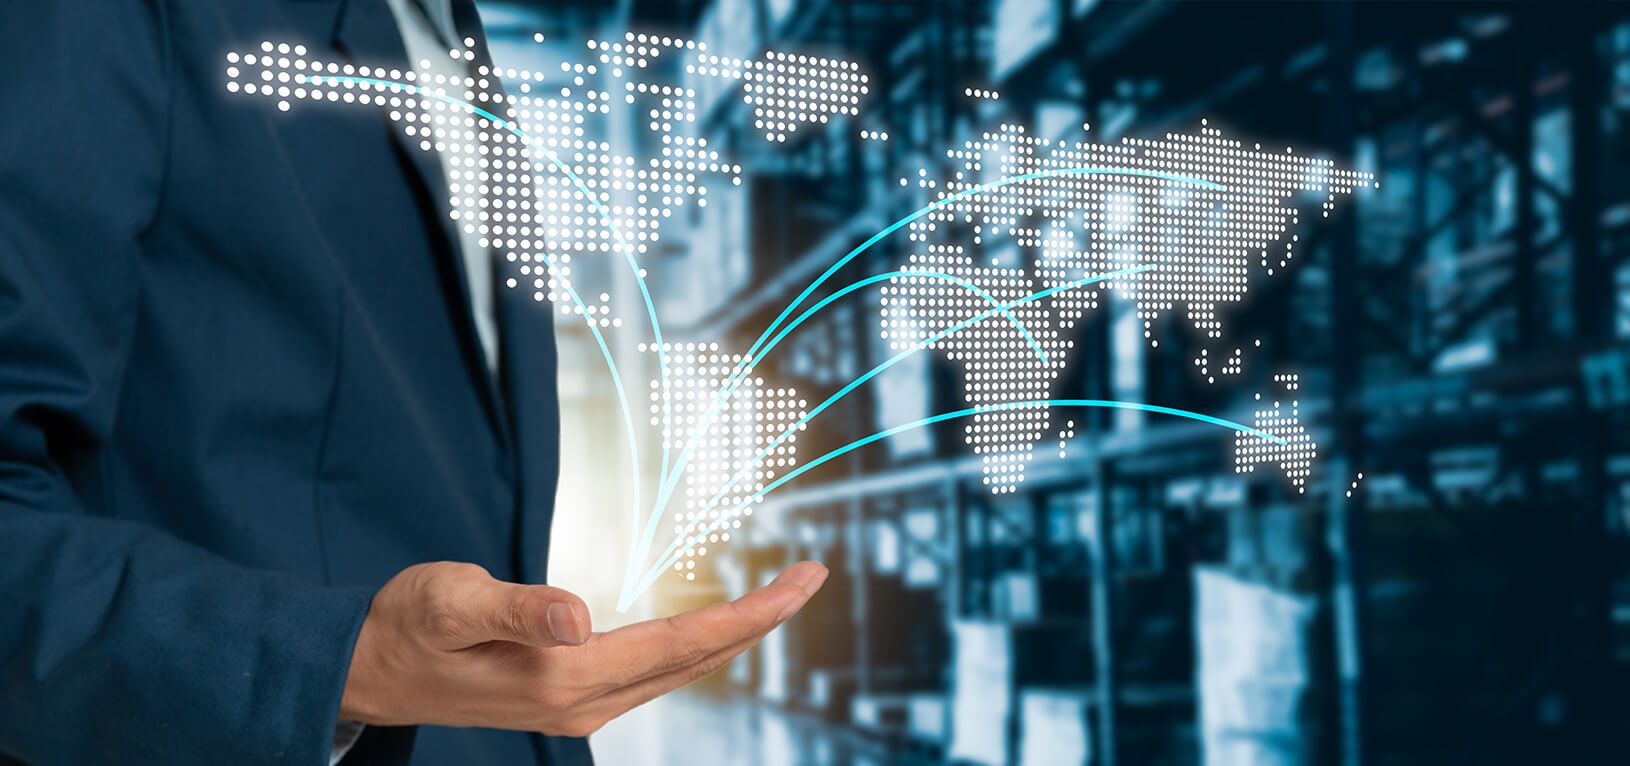 Hackensack Brand Strategist, Media Planning and Media Buying